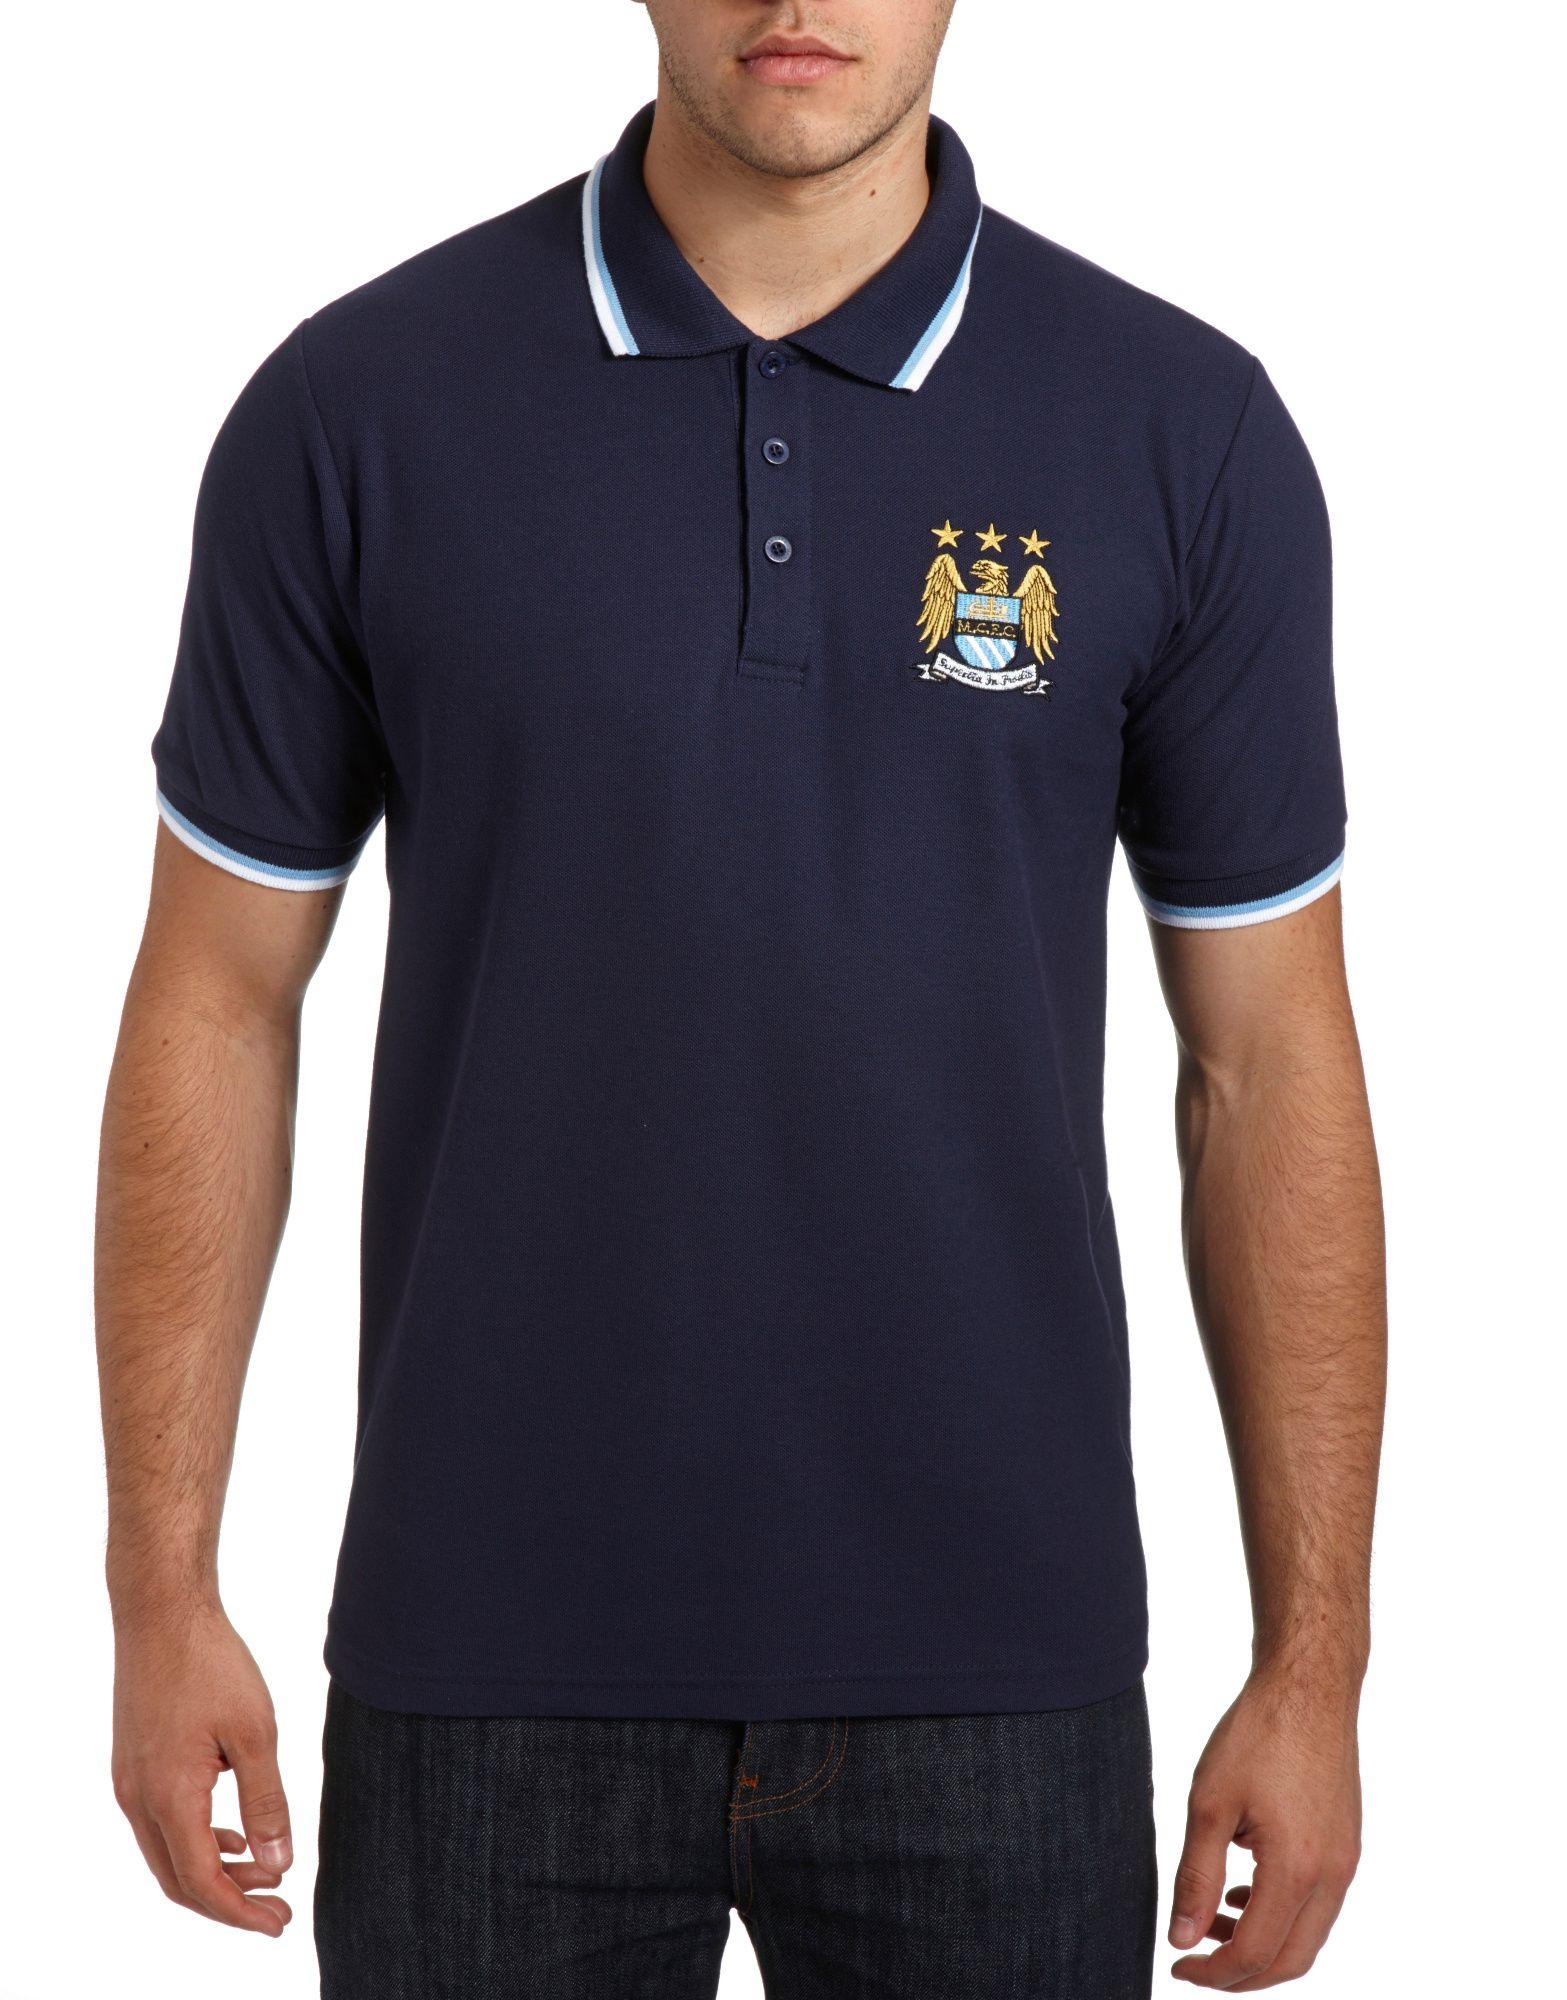 Official Team Manchester City Polo Shirt